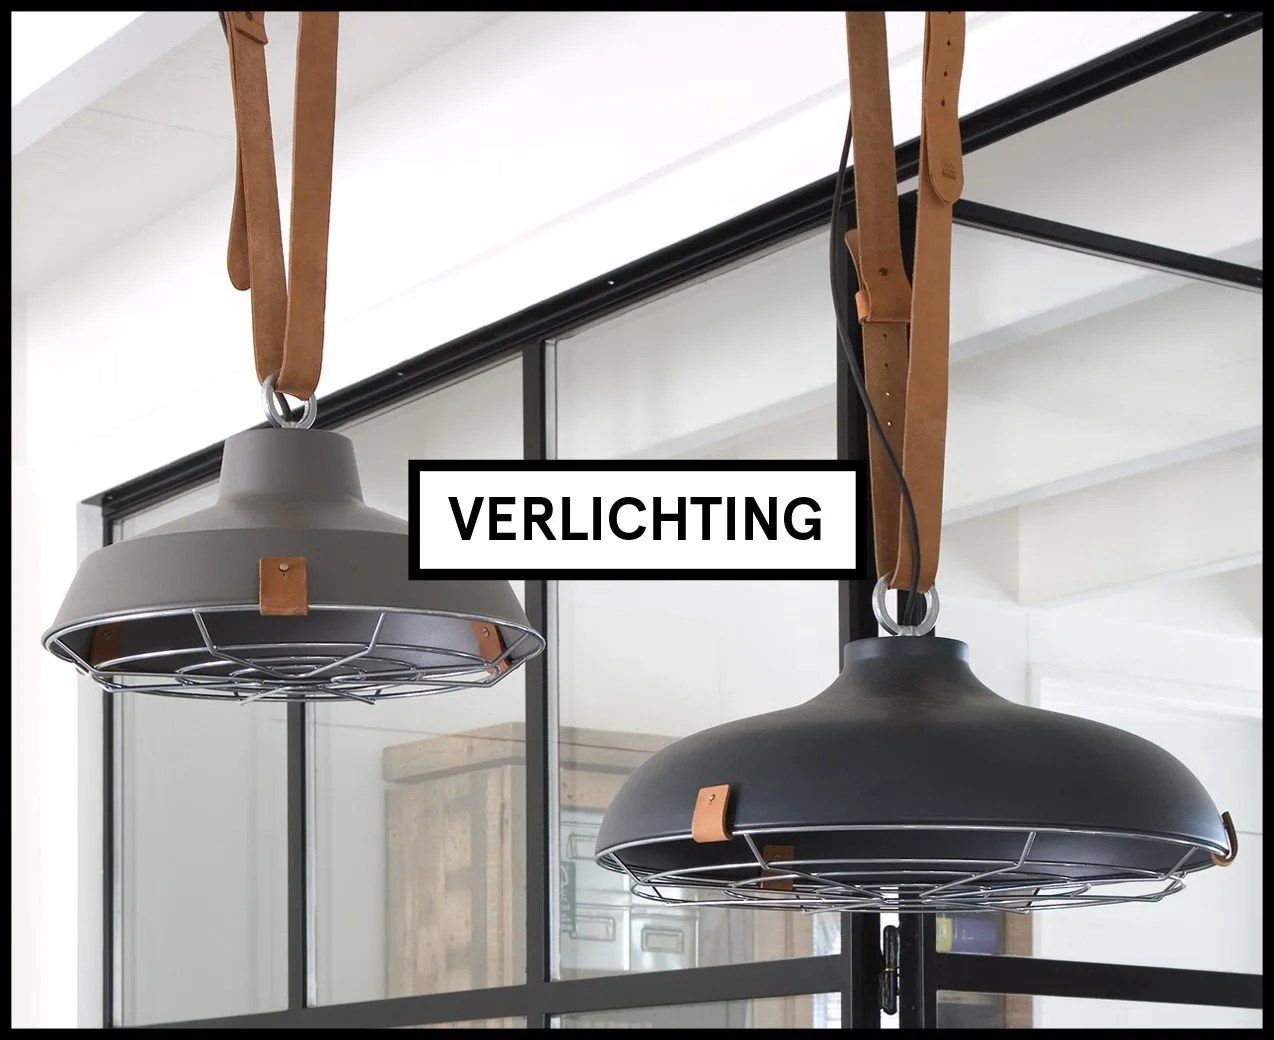 Design Meubels Enschede : Design verlichting enschede winand lichtenberg applicatie